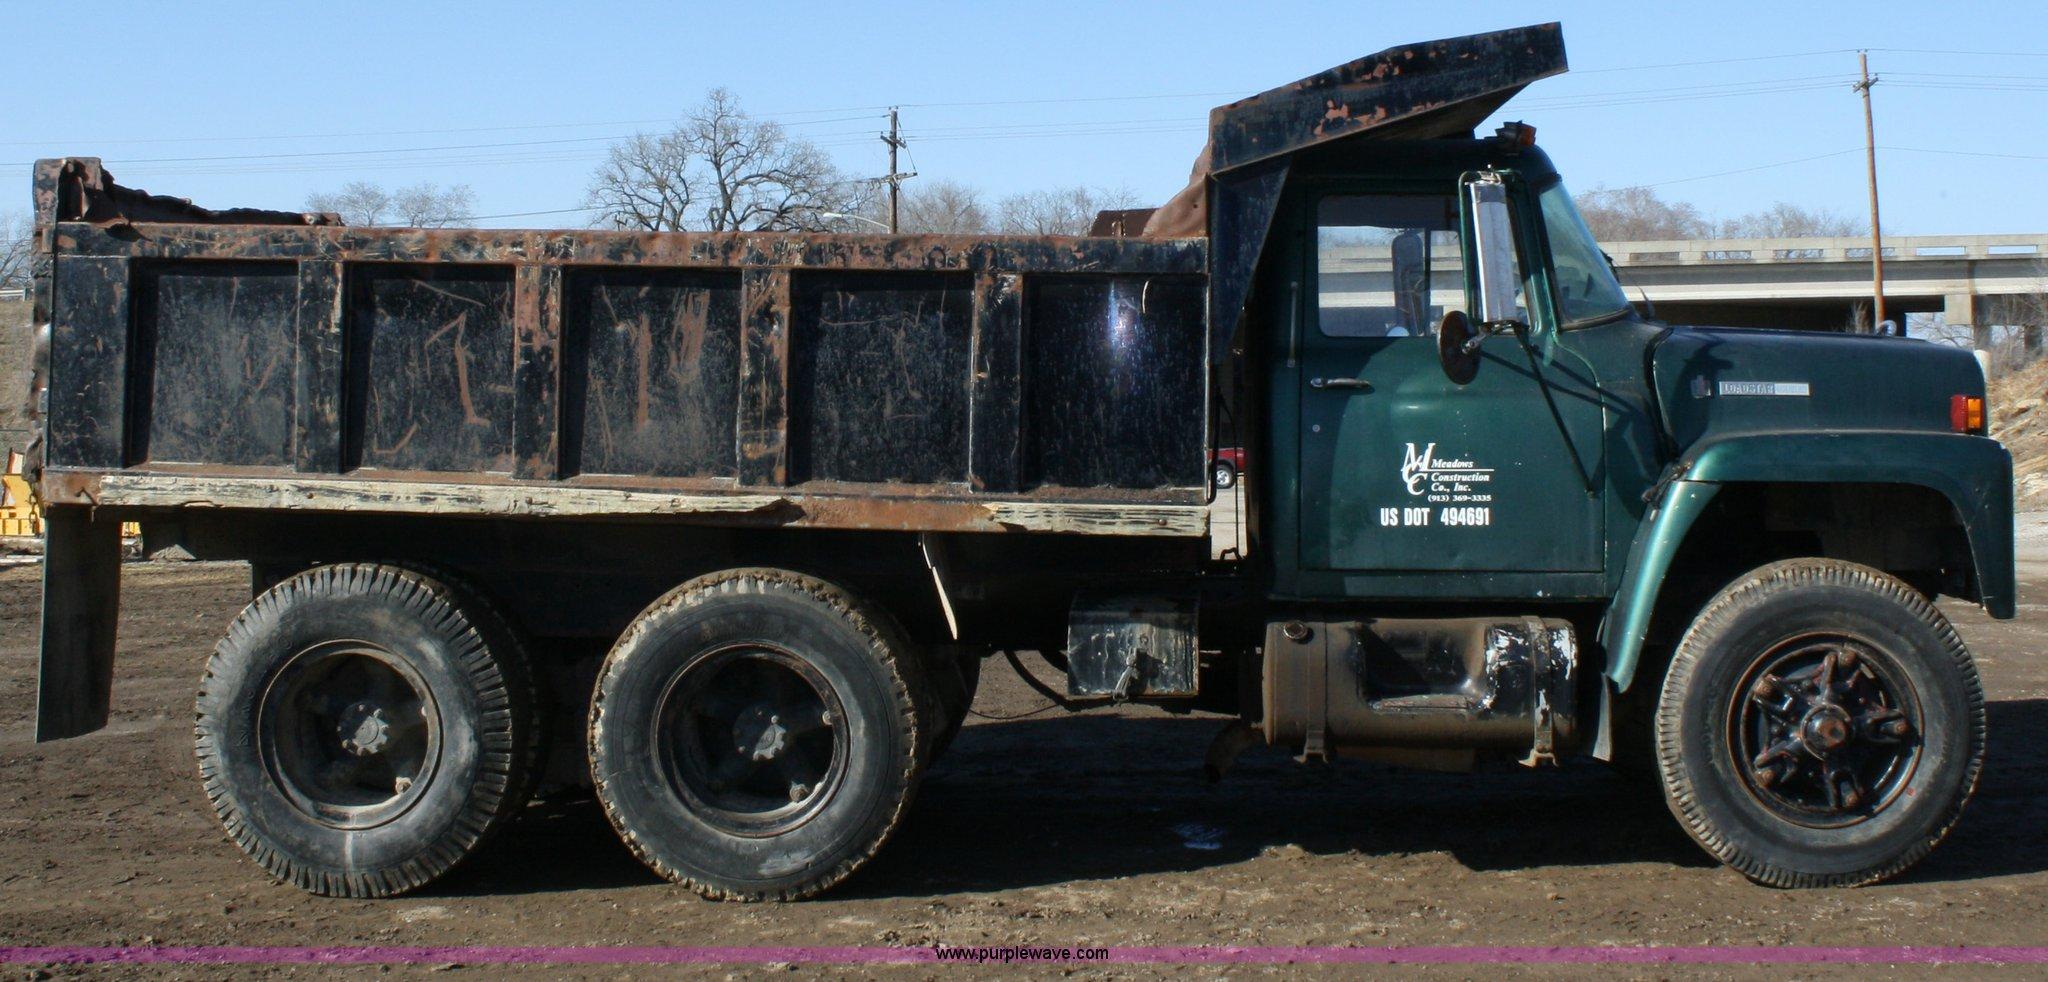 1978 International Loadstar 1700 dump truck Item 4793